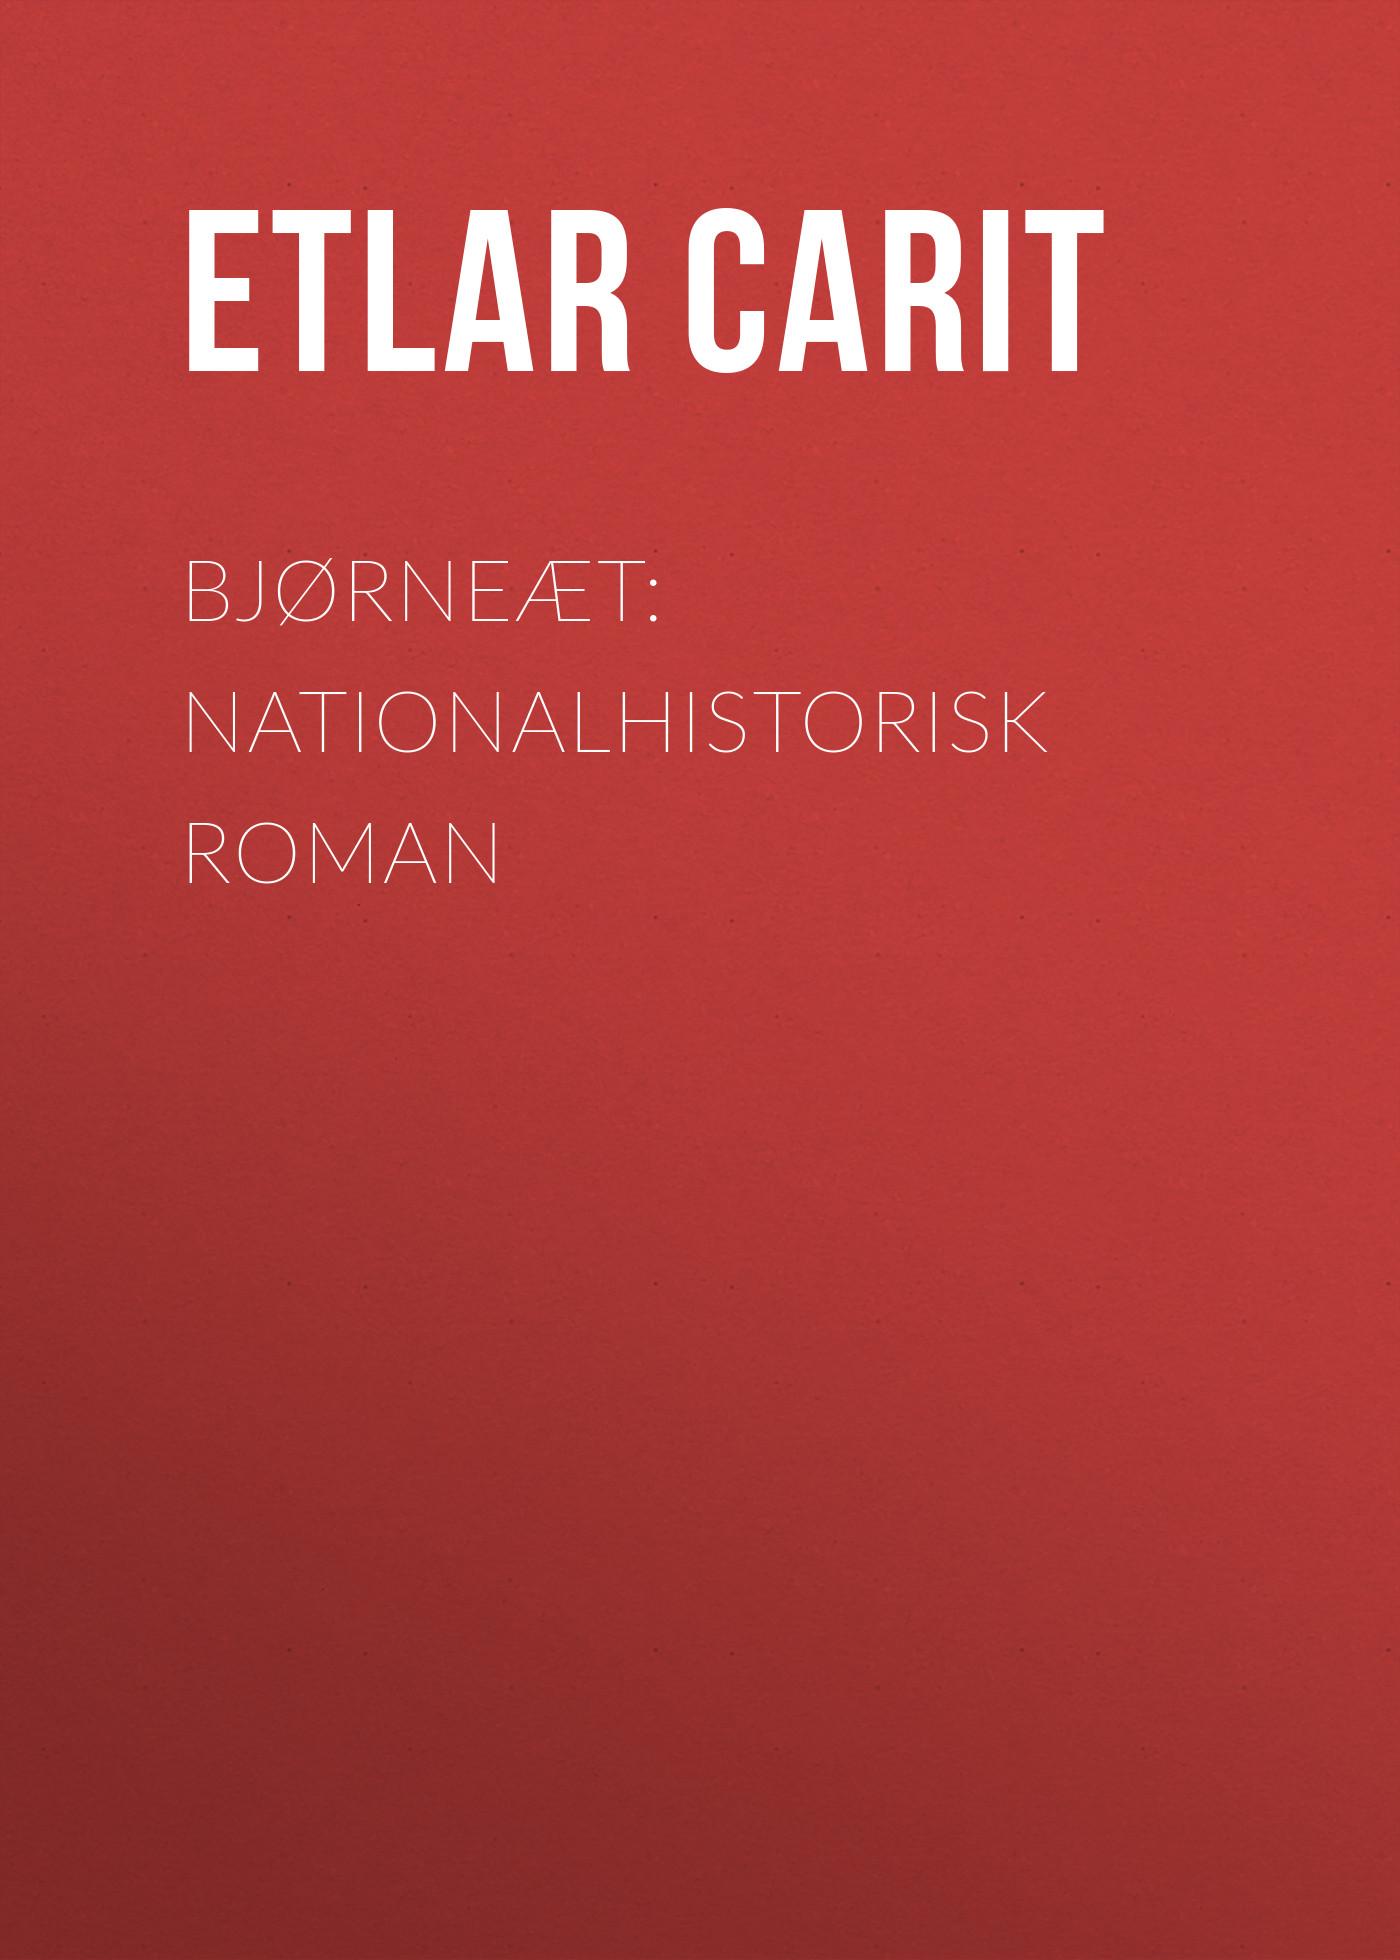 цена на Etlar Carit Bjørneæt: Nationalhistorisk Roman